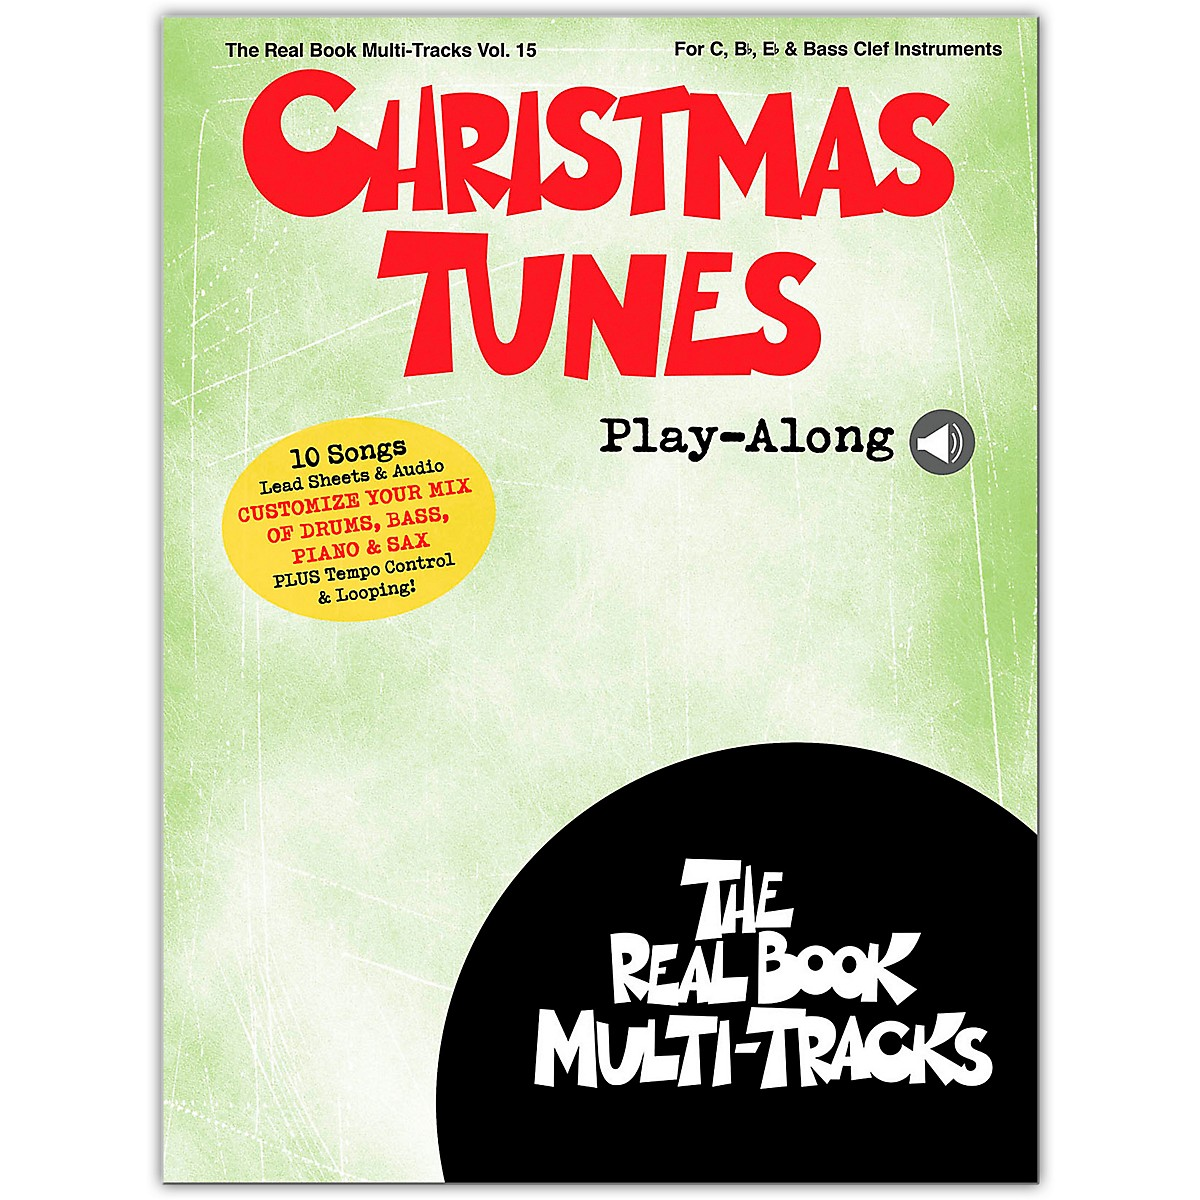 Hal Leonard Christmas Tunes Play-Along Real Book Multi-Tracks Songbook Book/Media Online